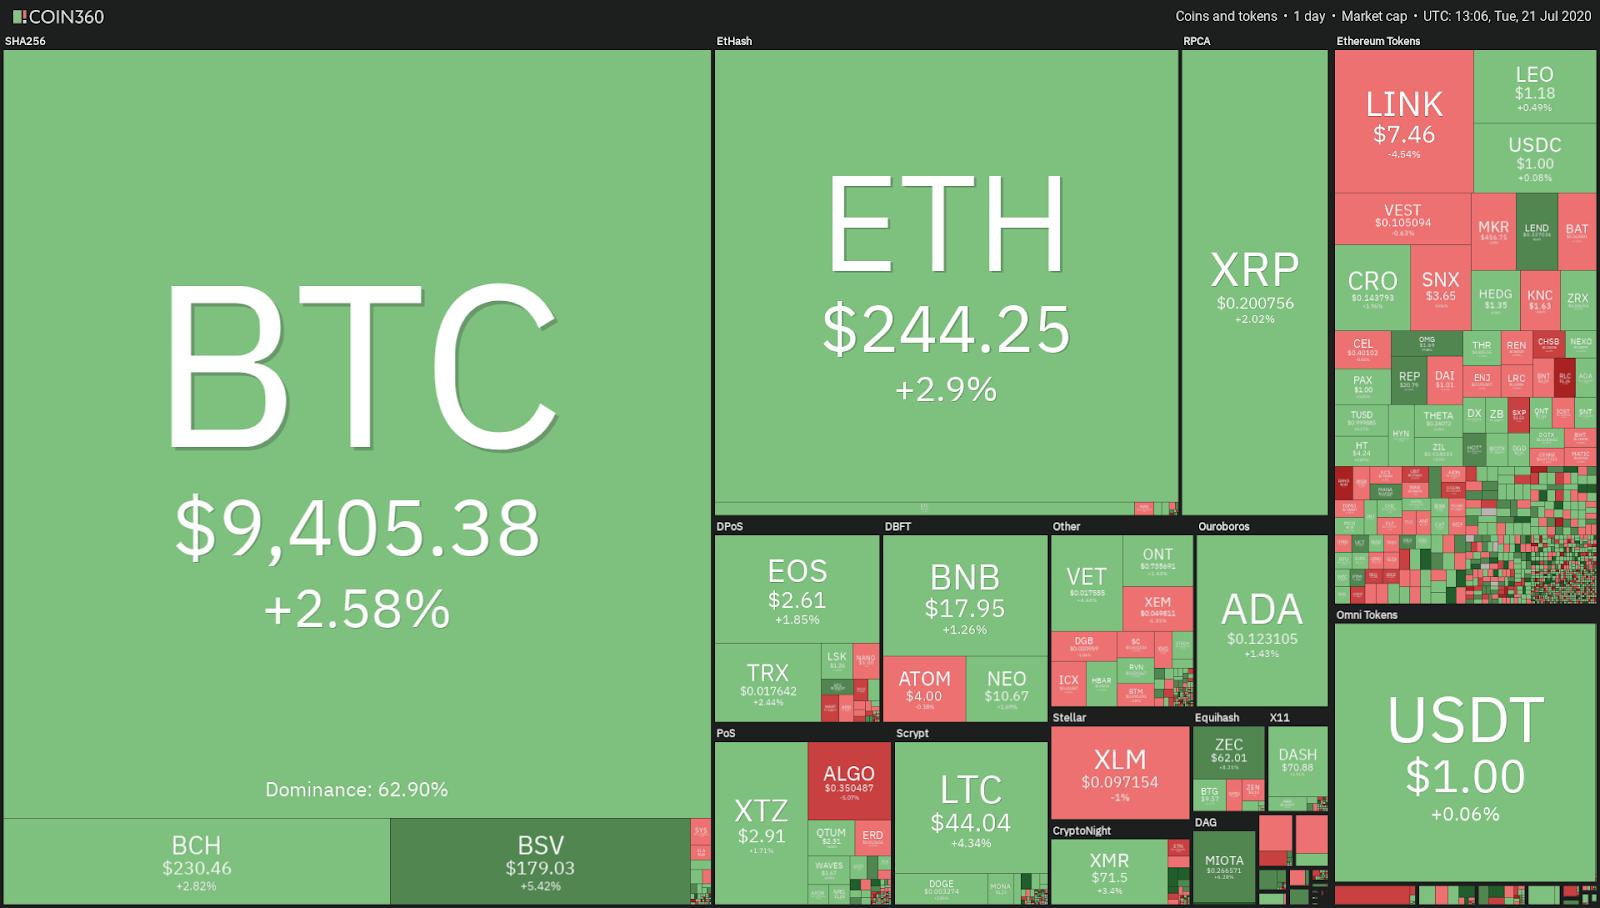 Crypto market daily performance. Source: TradingView